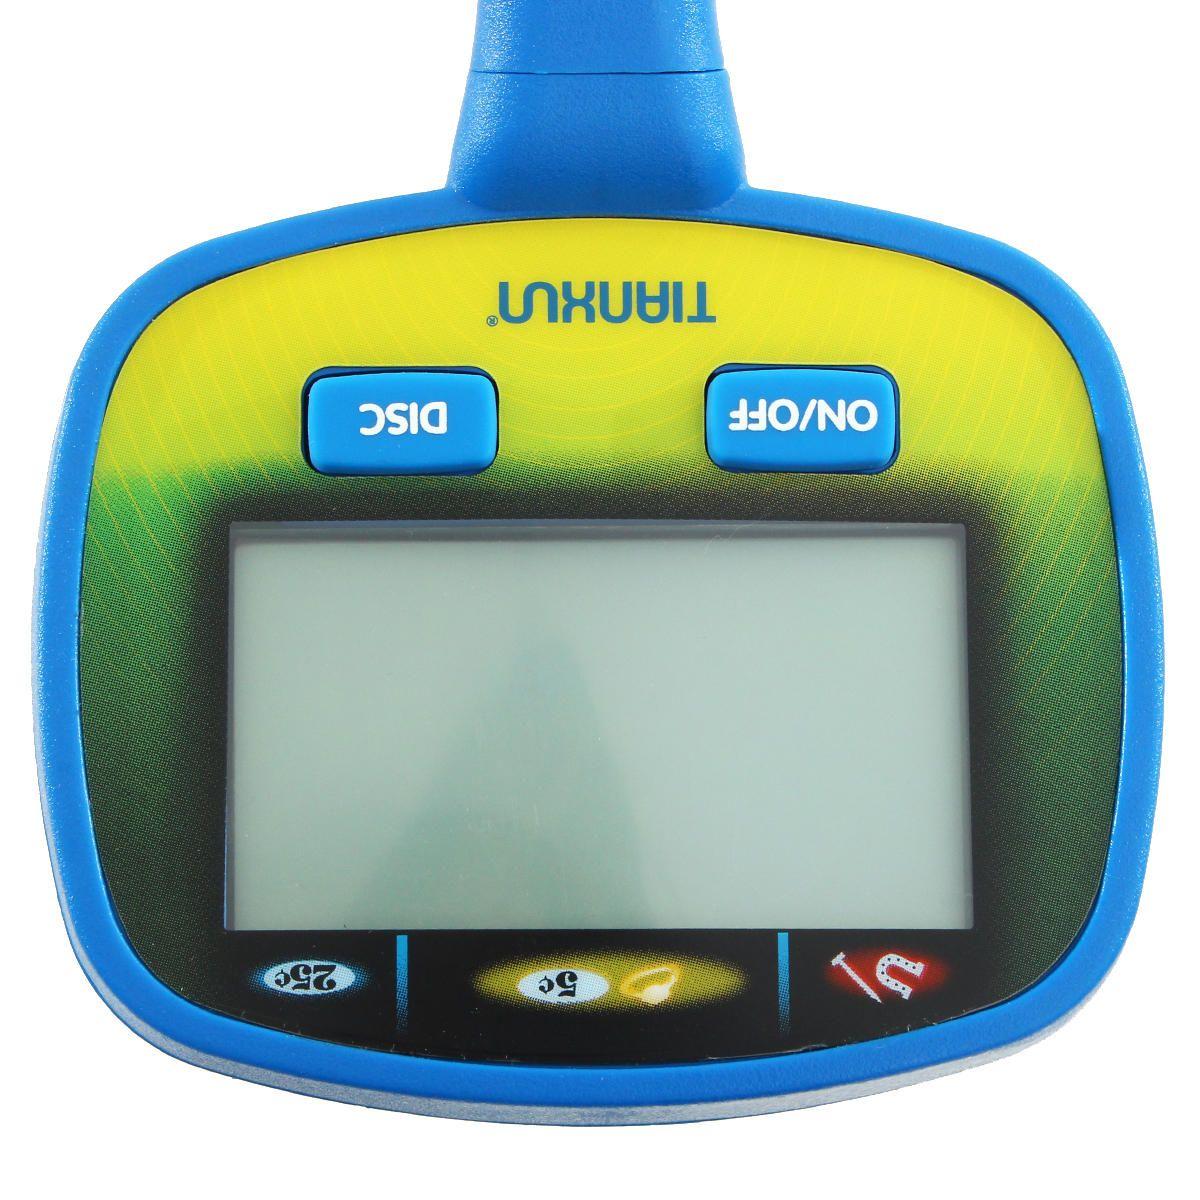 PUG US$51.49 MD-1010 Handheld Metal Detector Underground Tester Iron Gold Silver Finder+ LCD Display